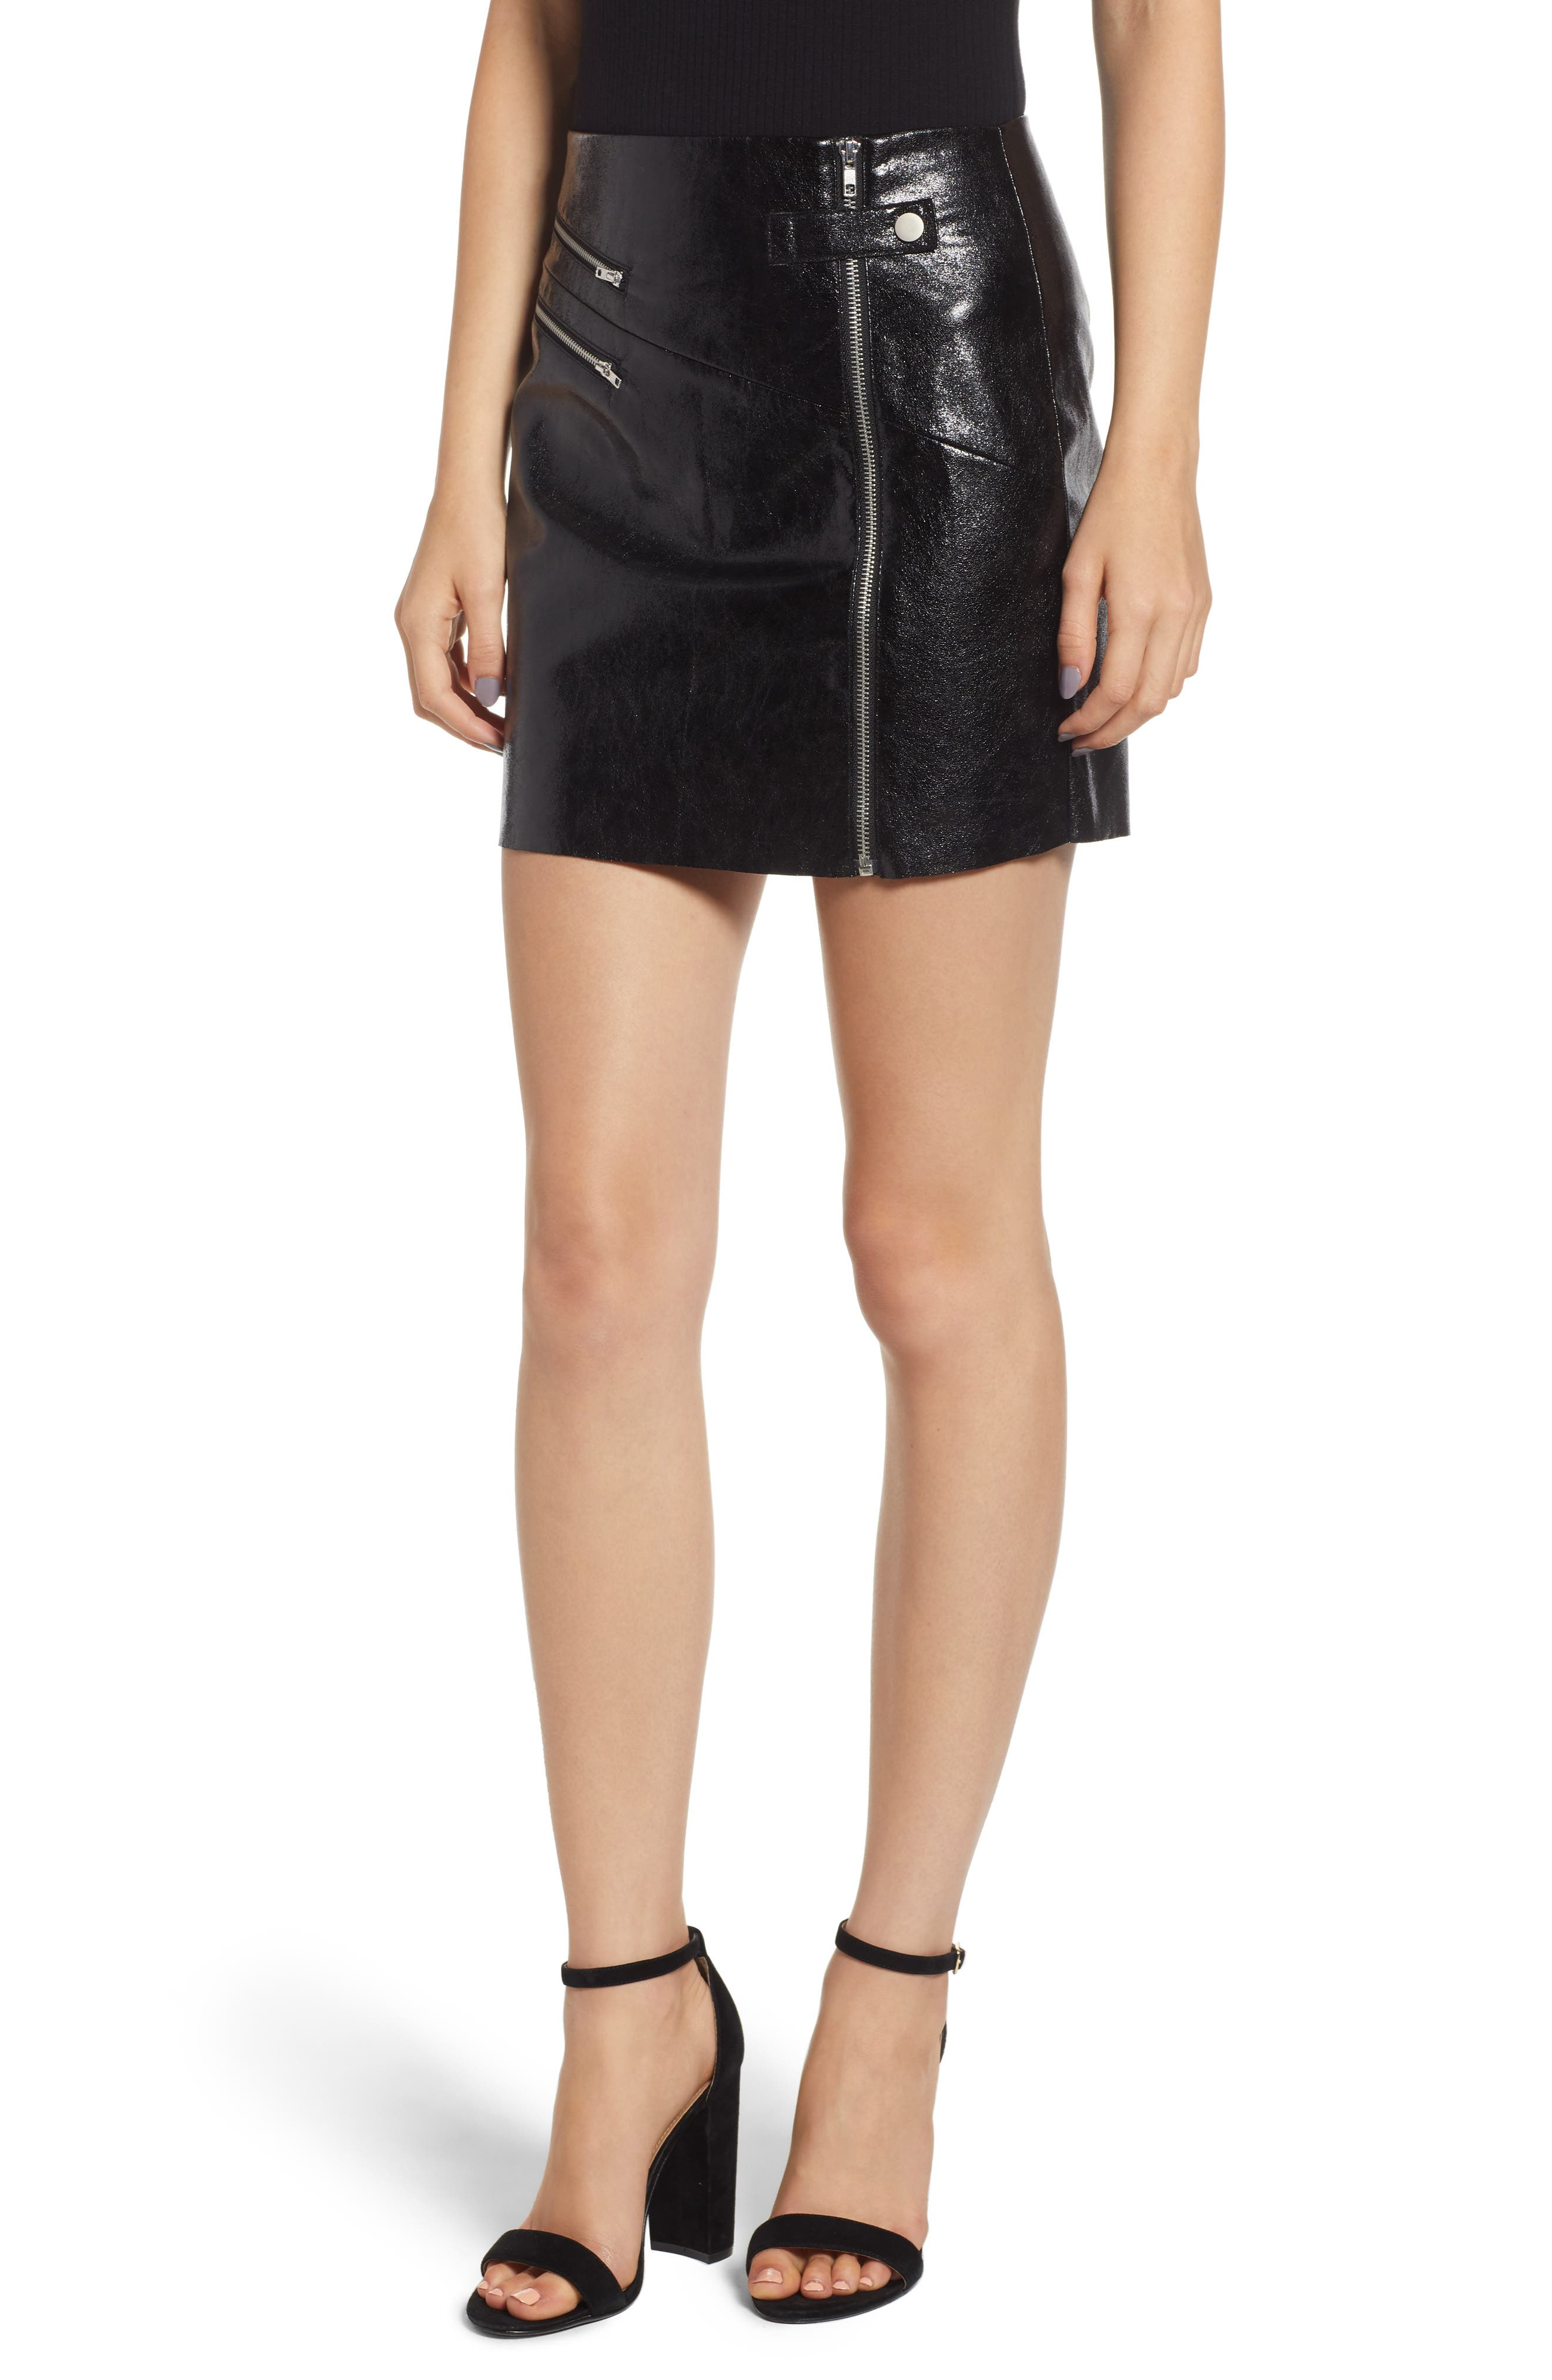 4Si3Nna Zipper Miniskirt, Black